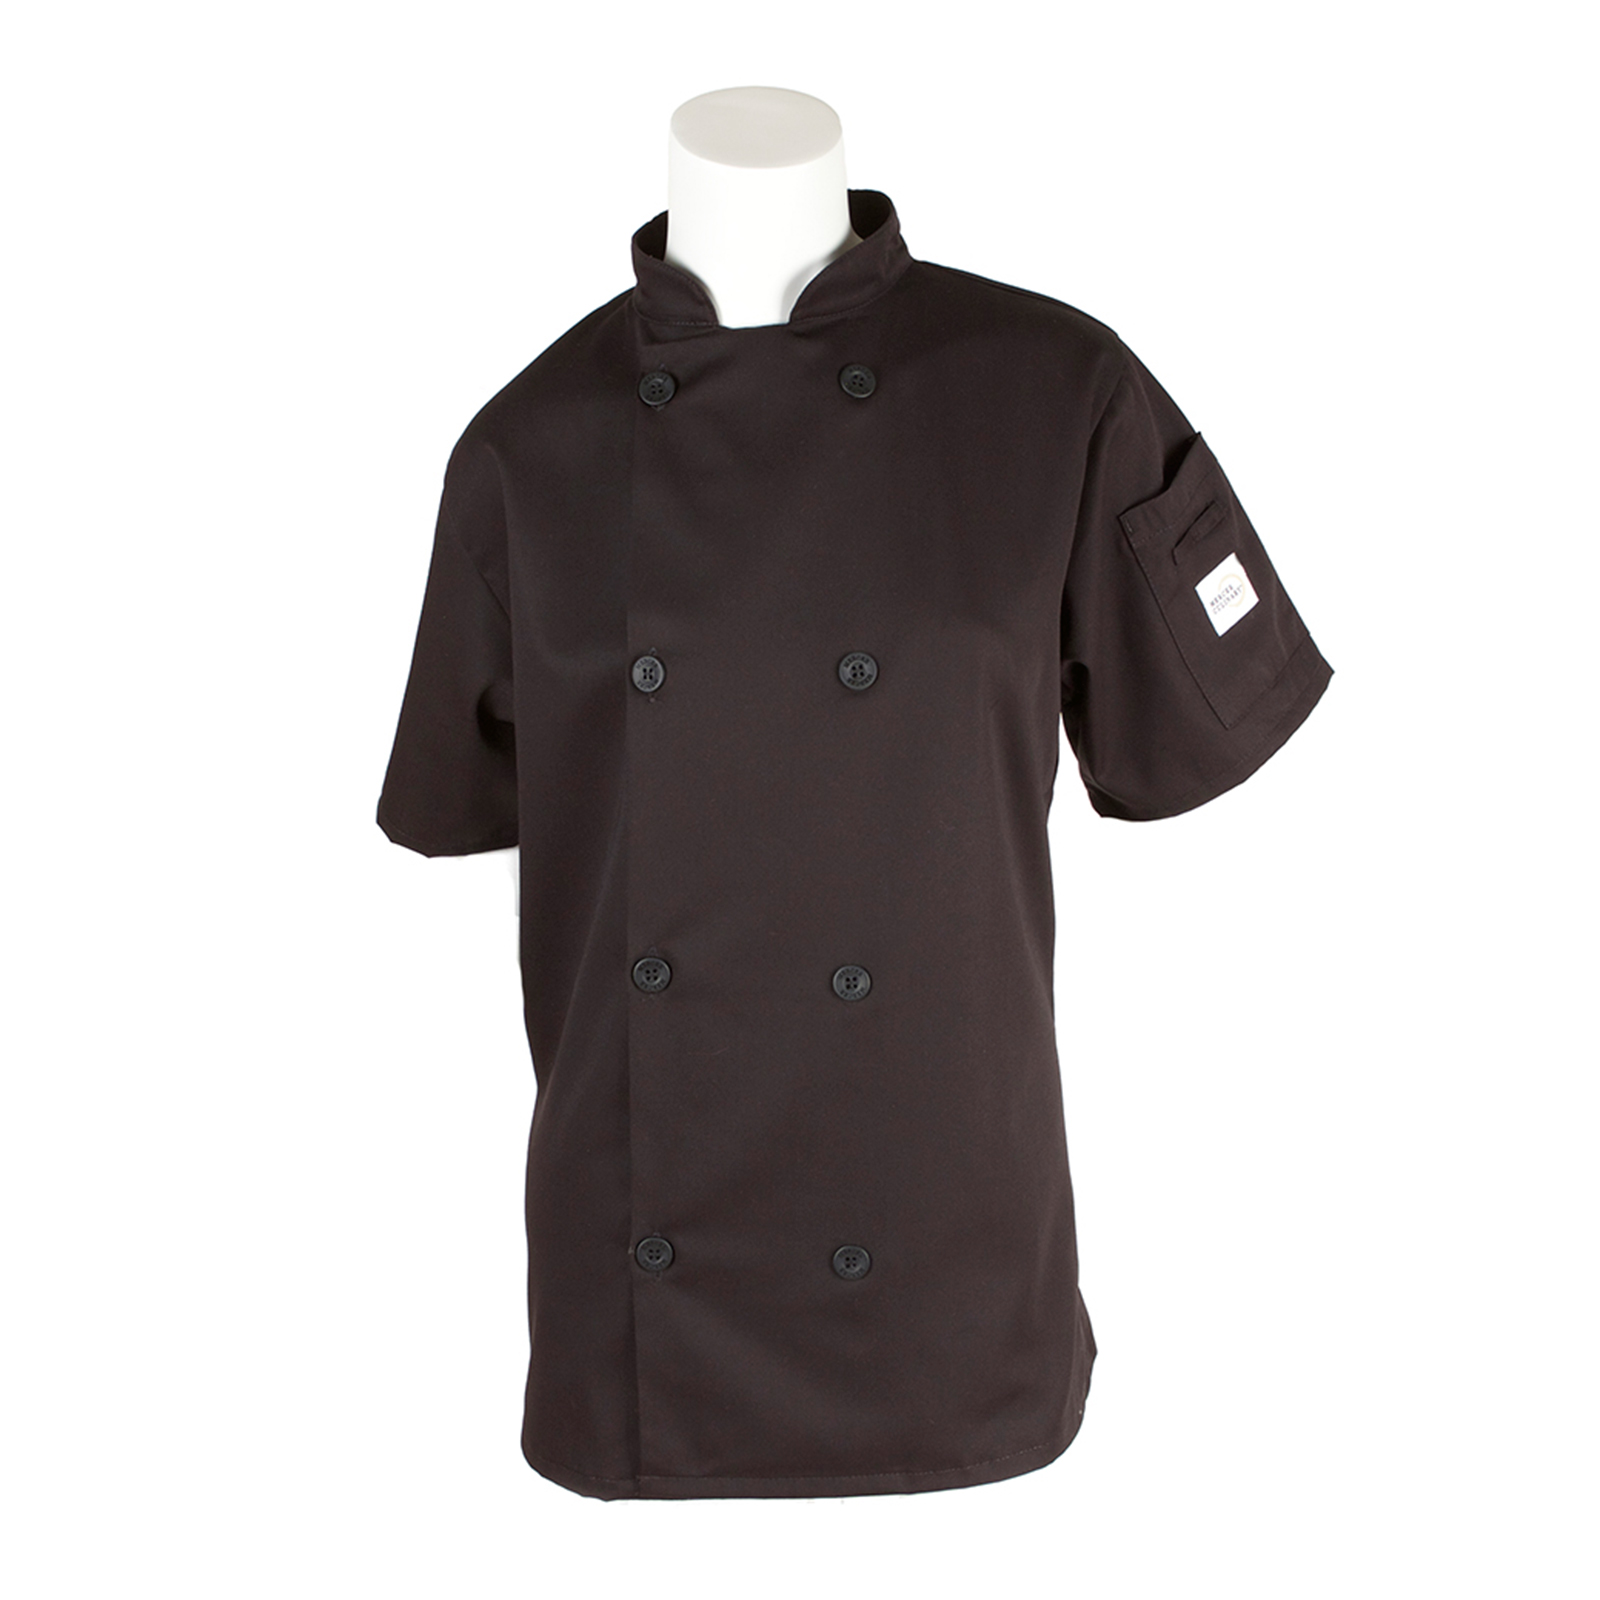 Mercer Culinary M60023BKXXS chef's coat